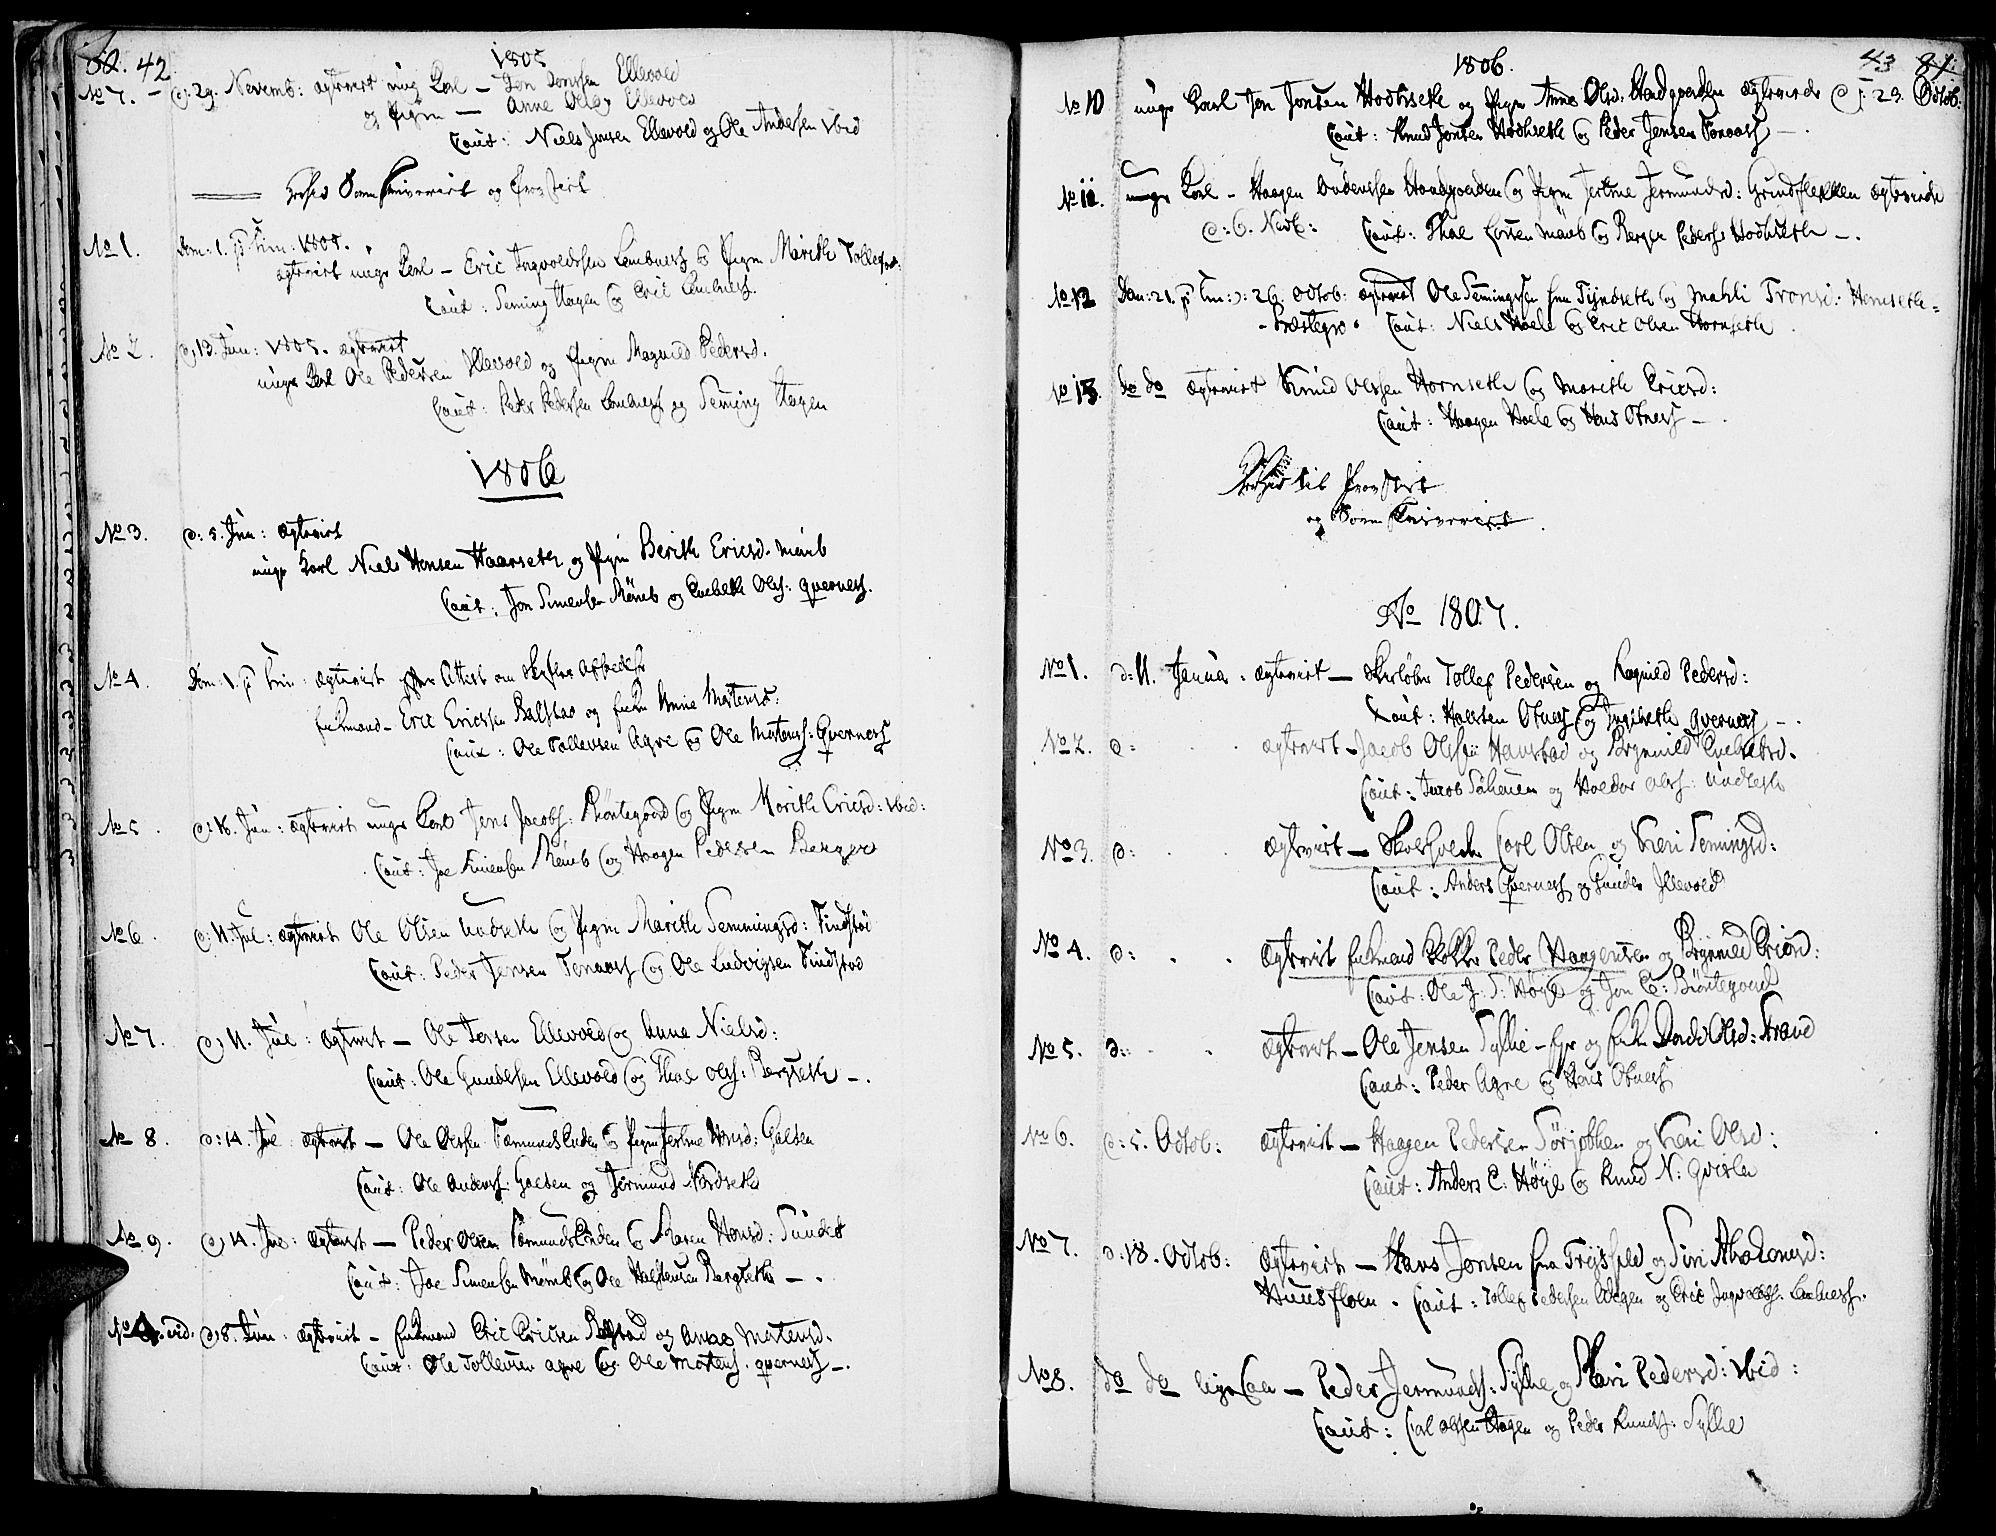 SAH, Rendalen prestekontor, H/Ha/Haa/L0002: Ministerialbok nr. 2, 1788-1814, s. 42-43